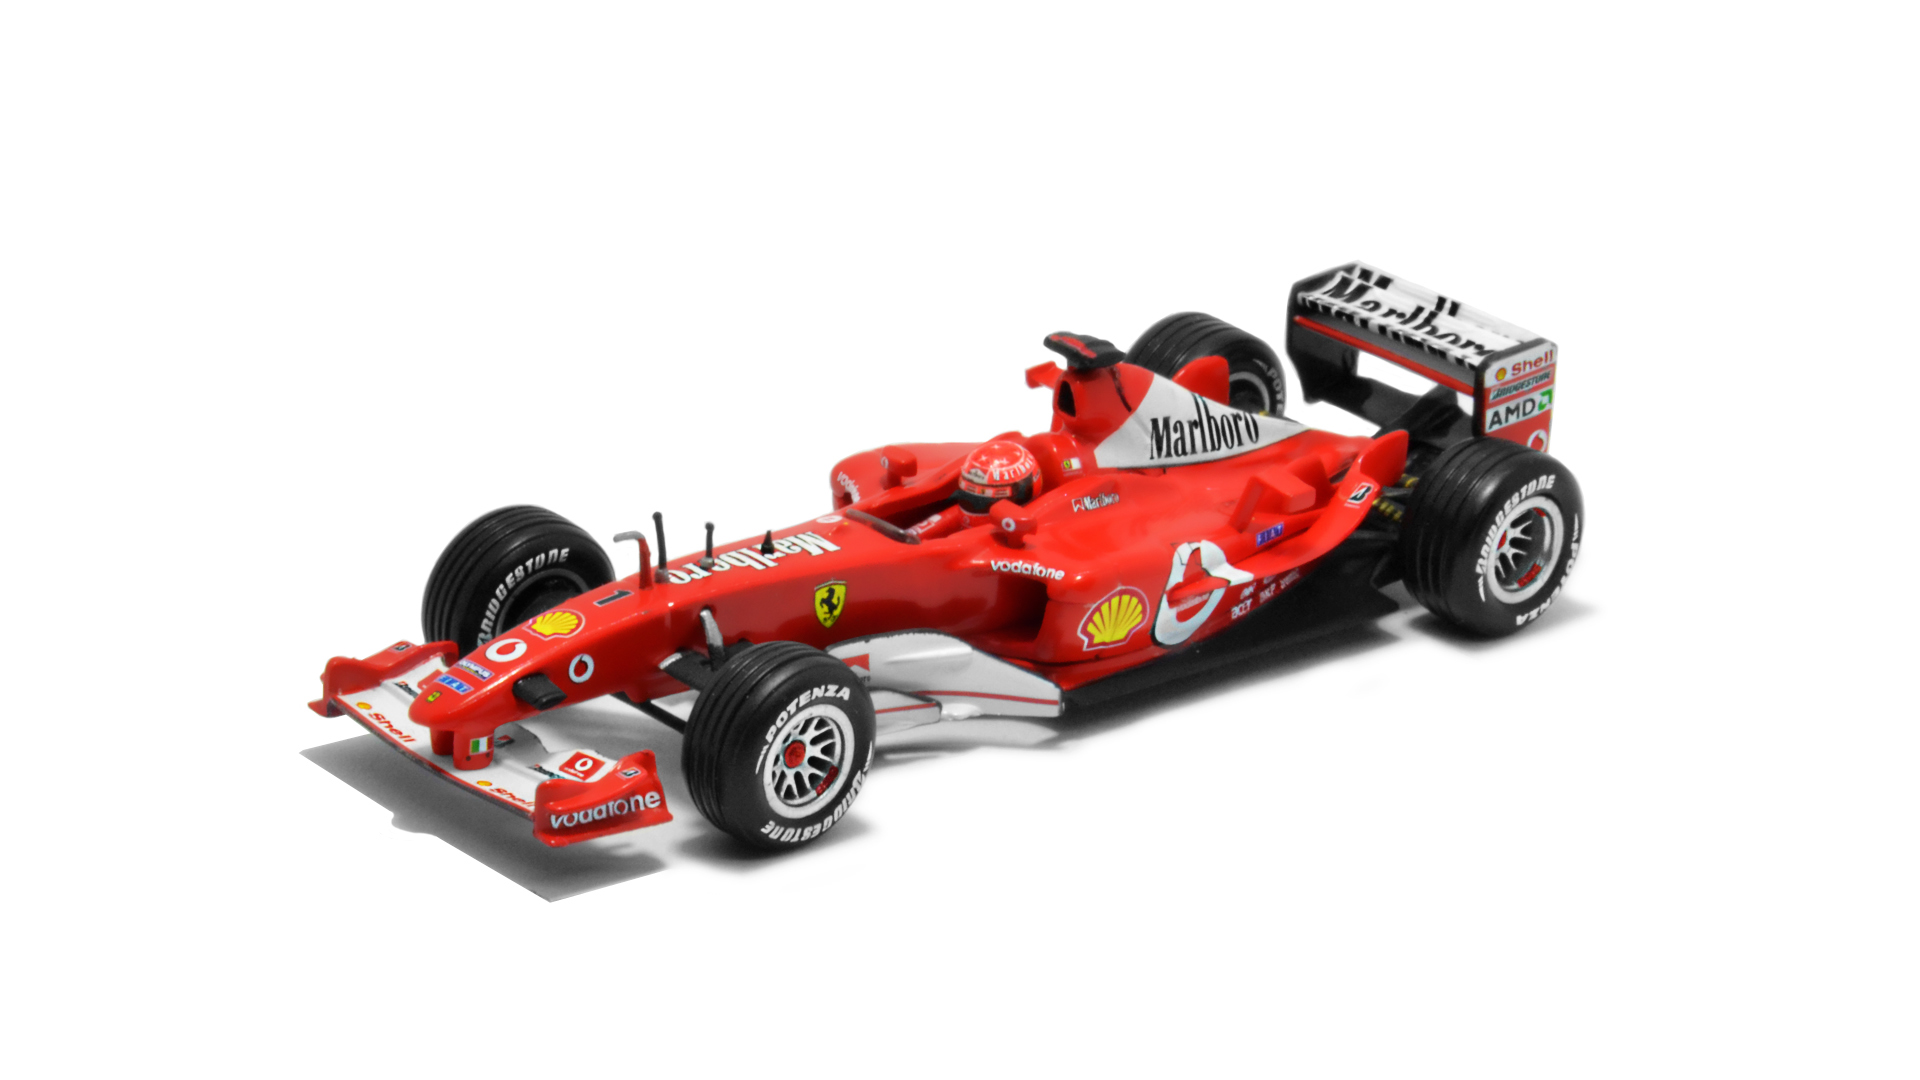 Év: 2003<br />Modell: F2003-GA<br />Gyártó: Hot Wheels<br />Pilóta: Michael Schumacher